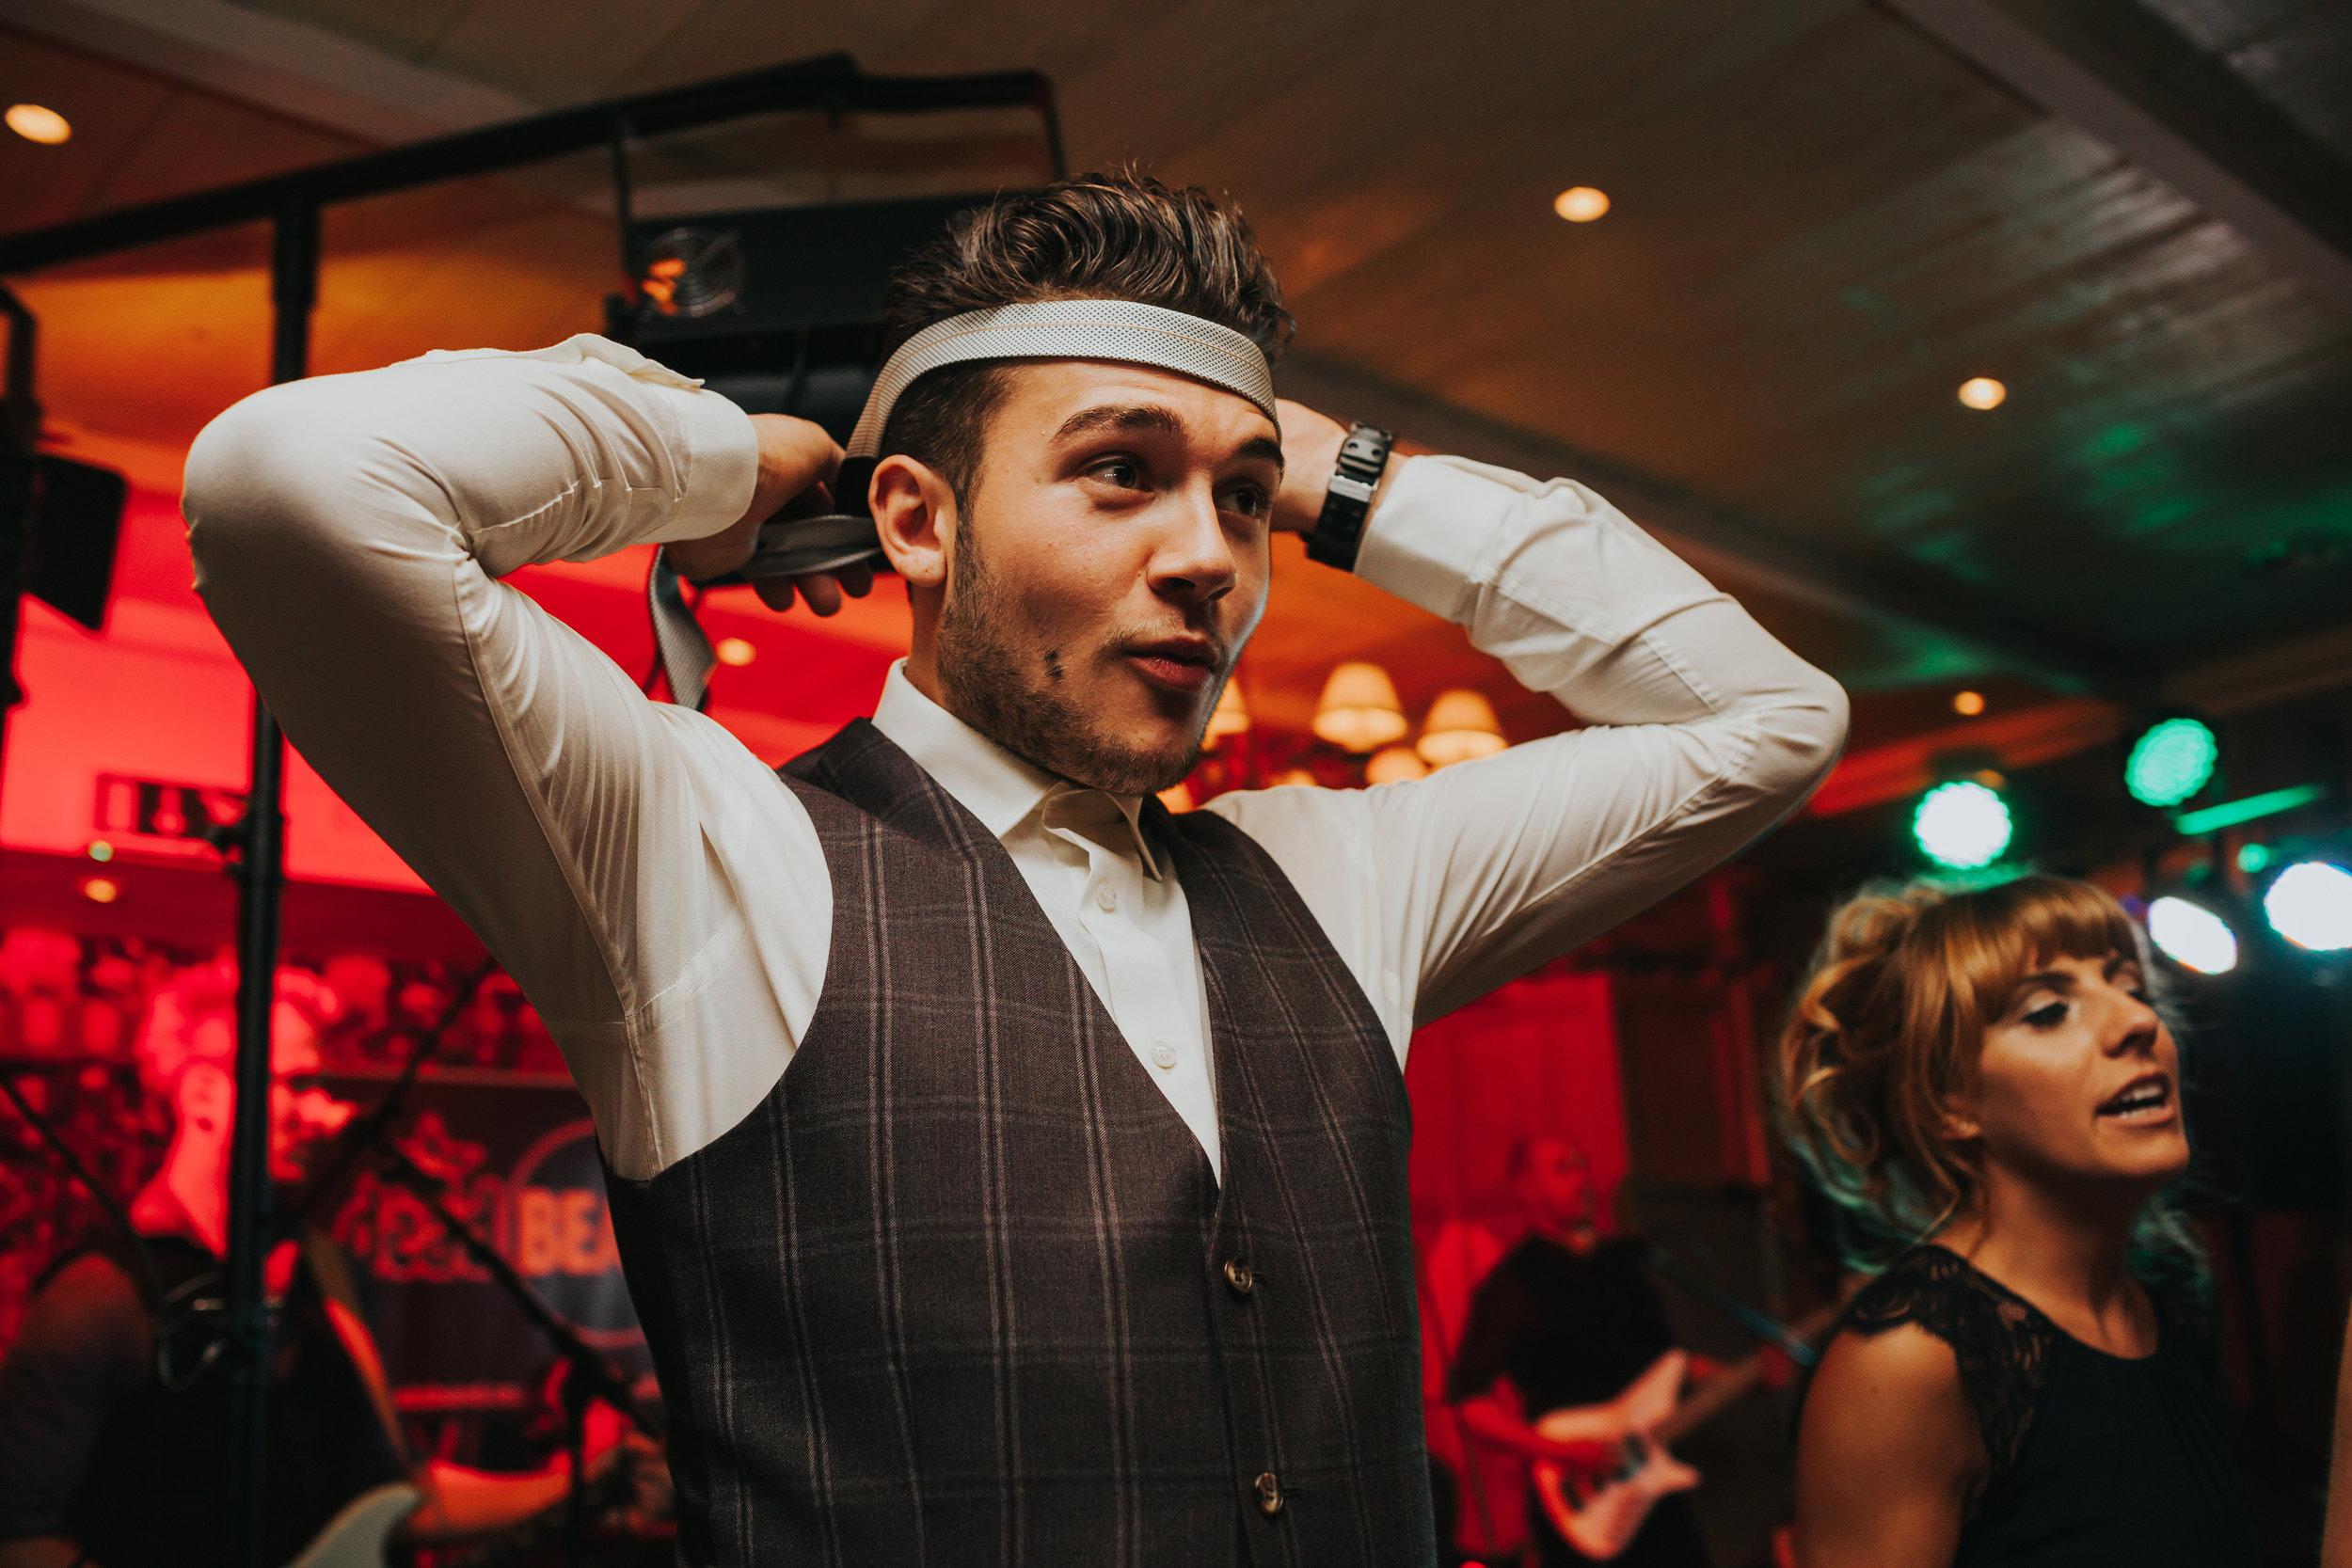 Guest ties his tie around his head.